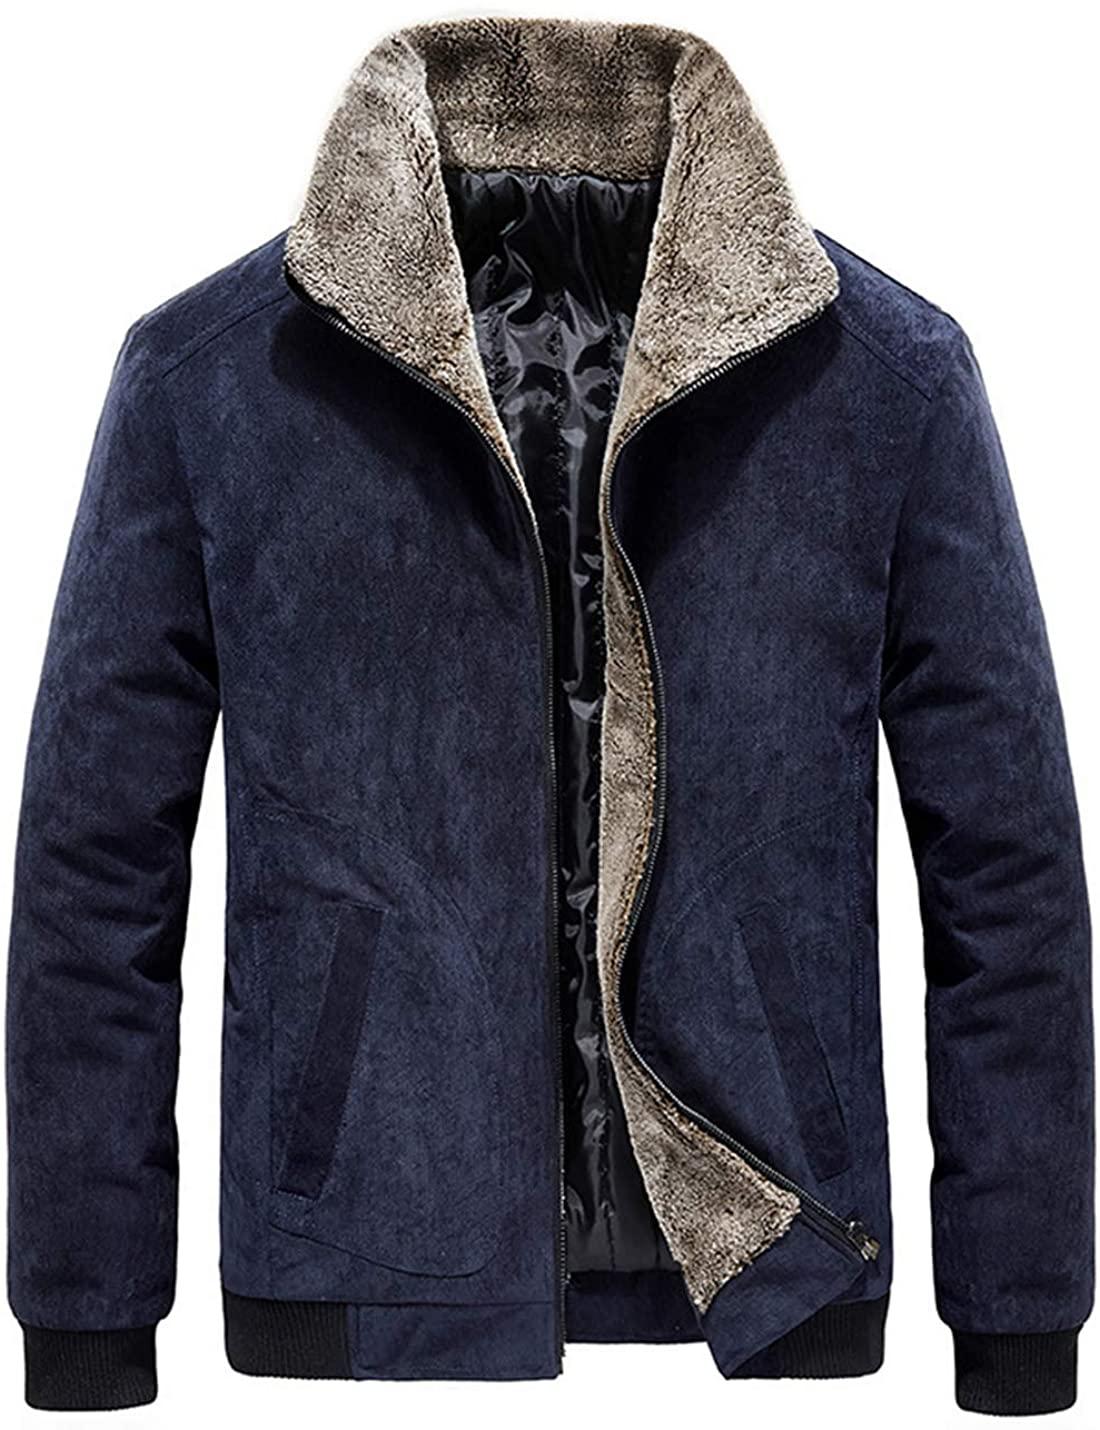 Men Solid Corduroy Loose Jacket Coat Sherpa Collar Warm Jacket Outwear Thicken